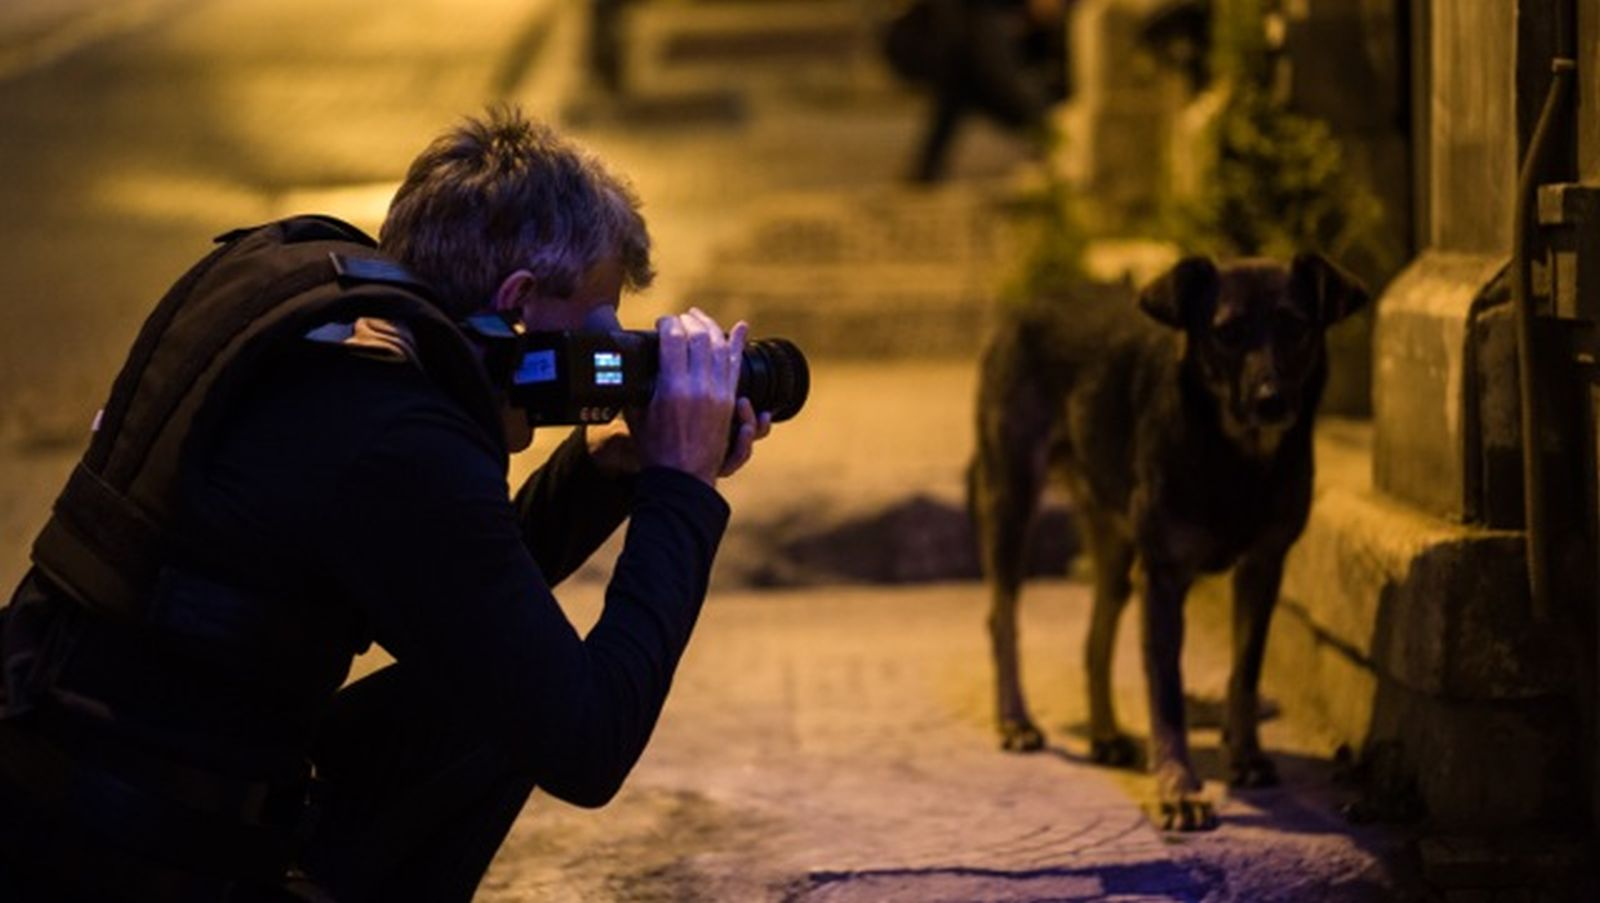 Innocence of Memories - Orhan Pamuk's Museum and Istanbul: il regista Grant Gee al lavoro sul set del film